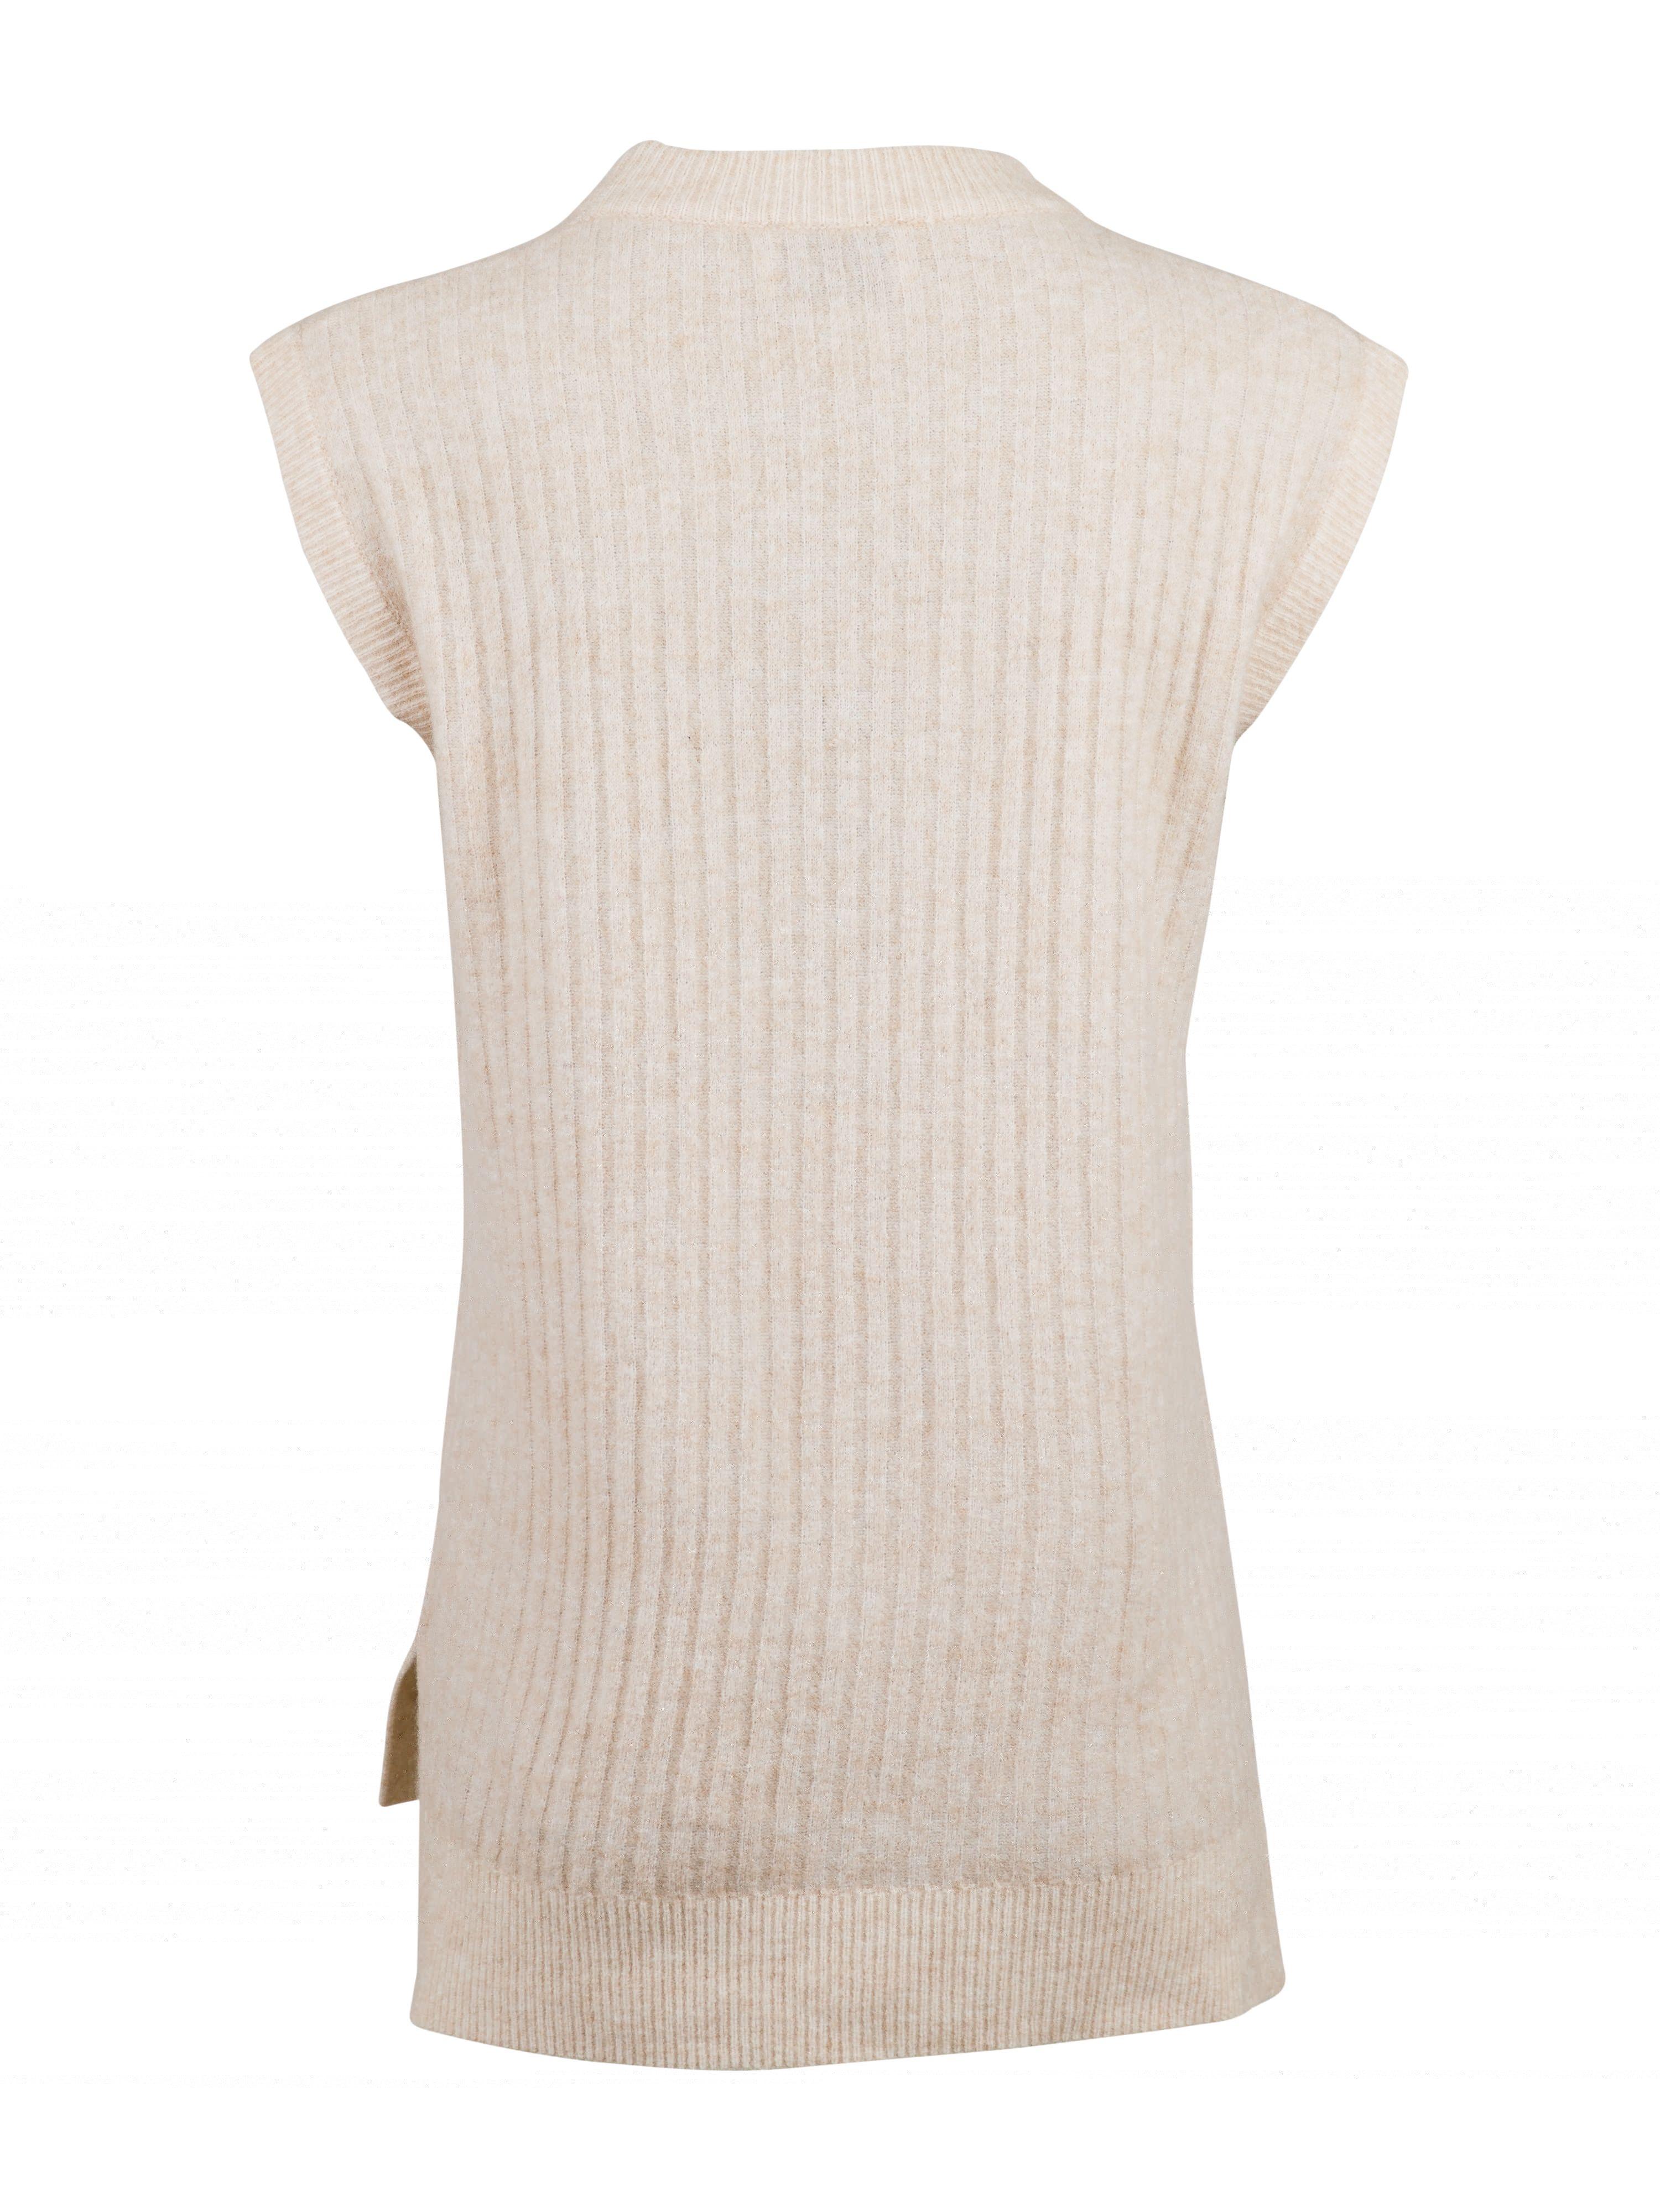 Neo Noir Natascha strik vest, sand melange, small